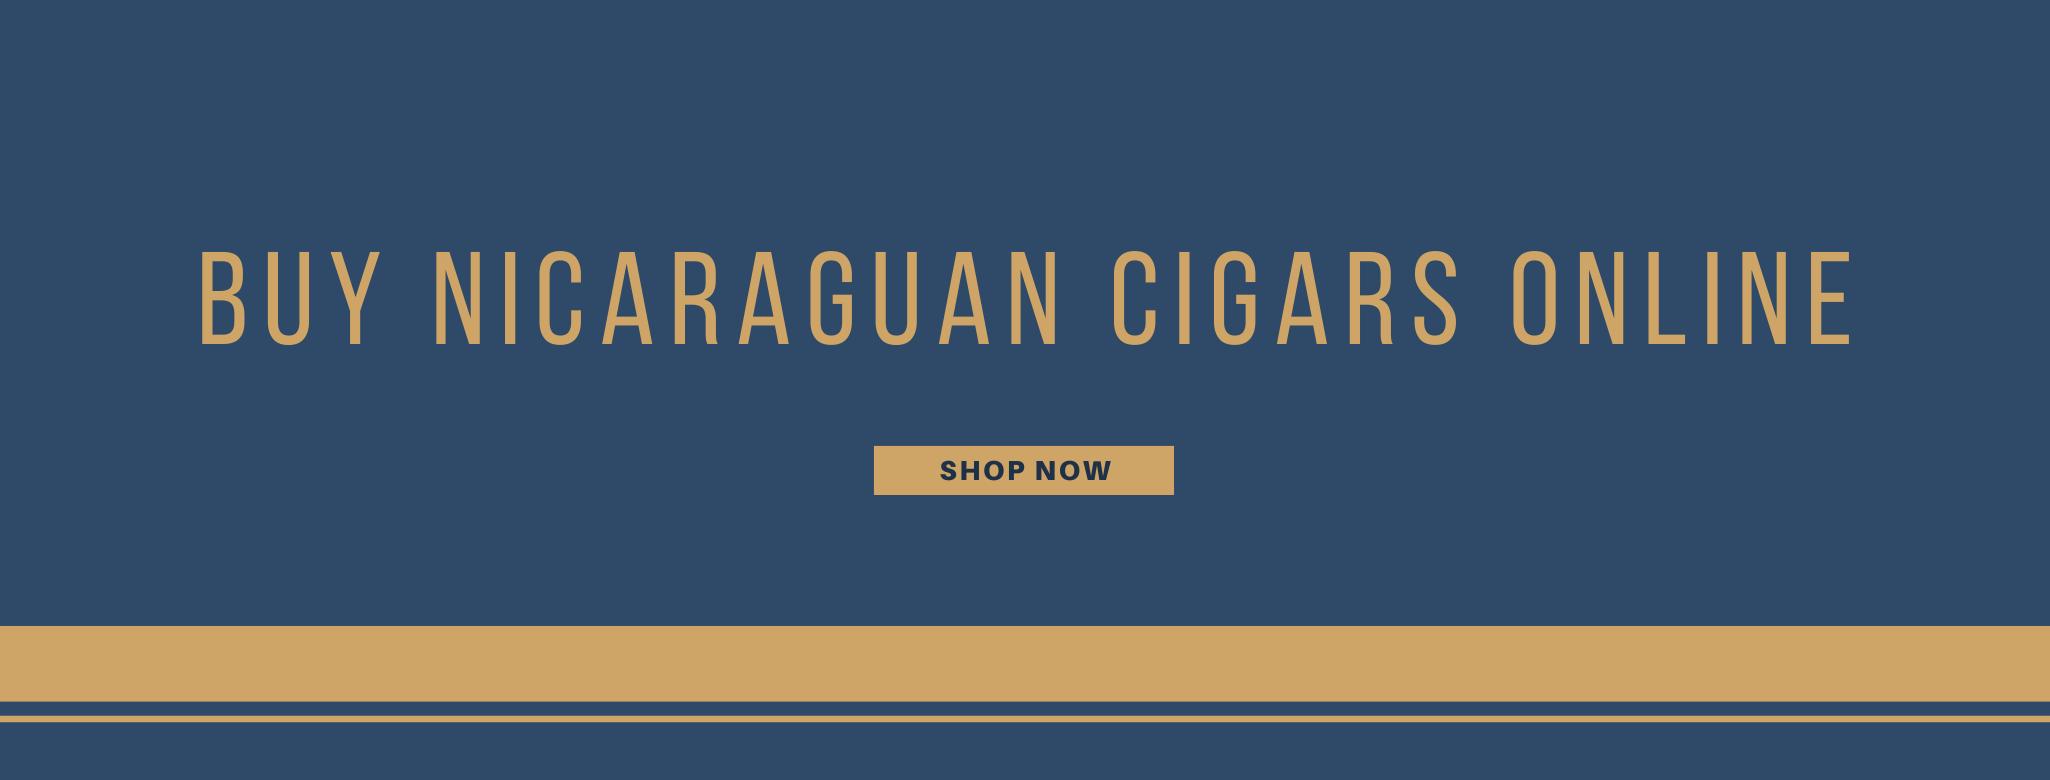 Buy Nicaraguan cigars online banner